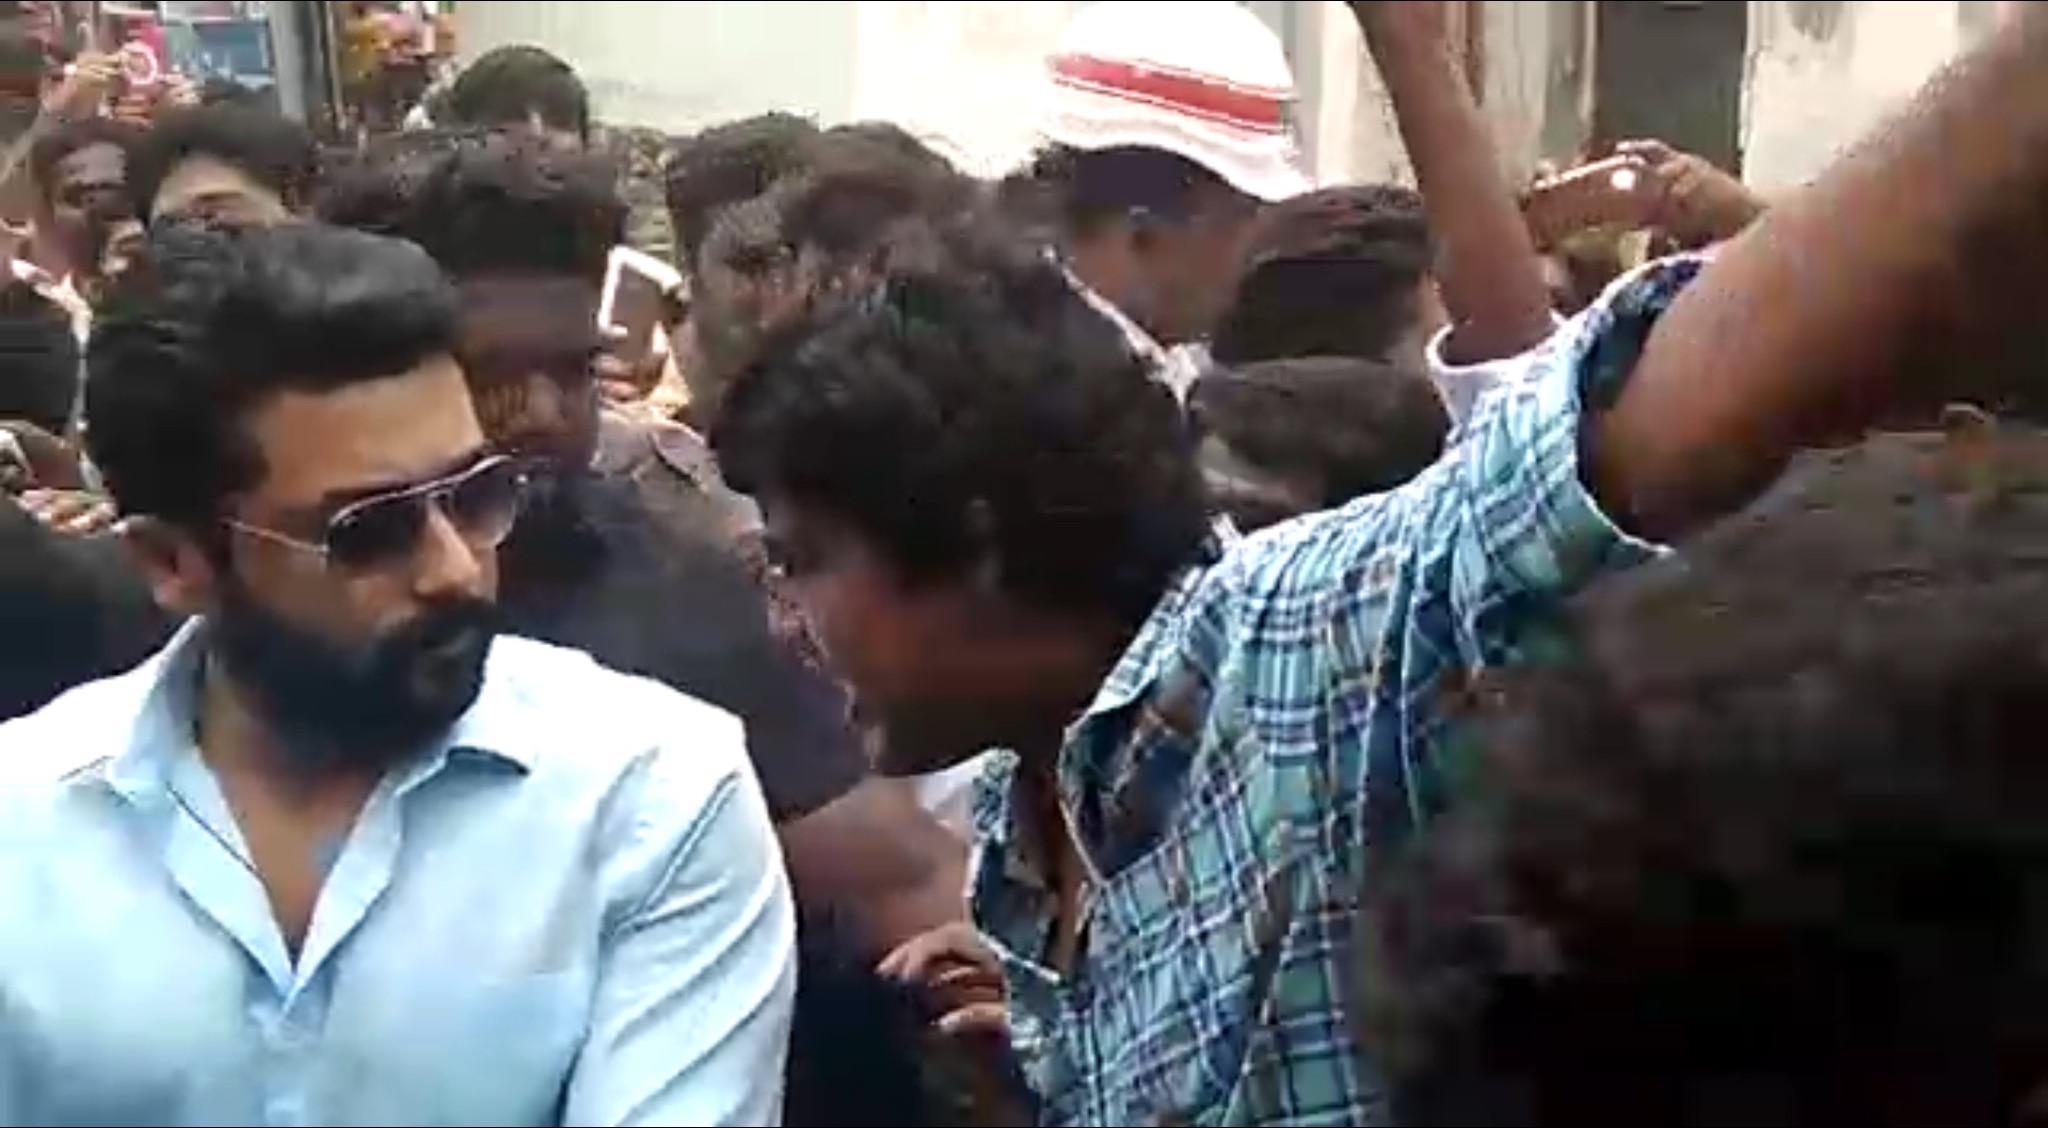 Suriya mobbed with 5000 Fans @NGK Shooting Spot in Rajahmundry